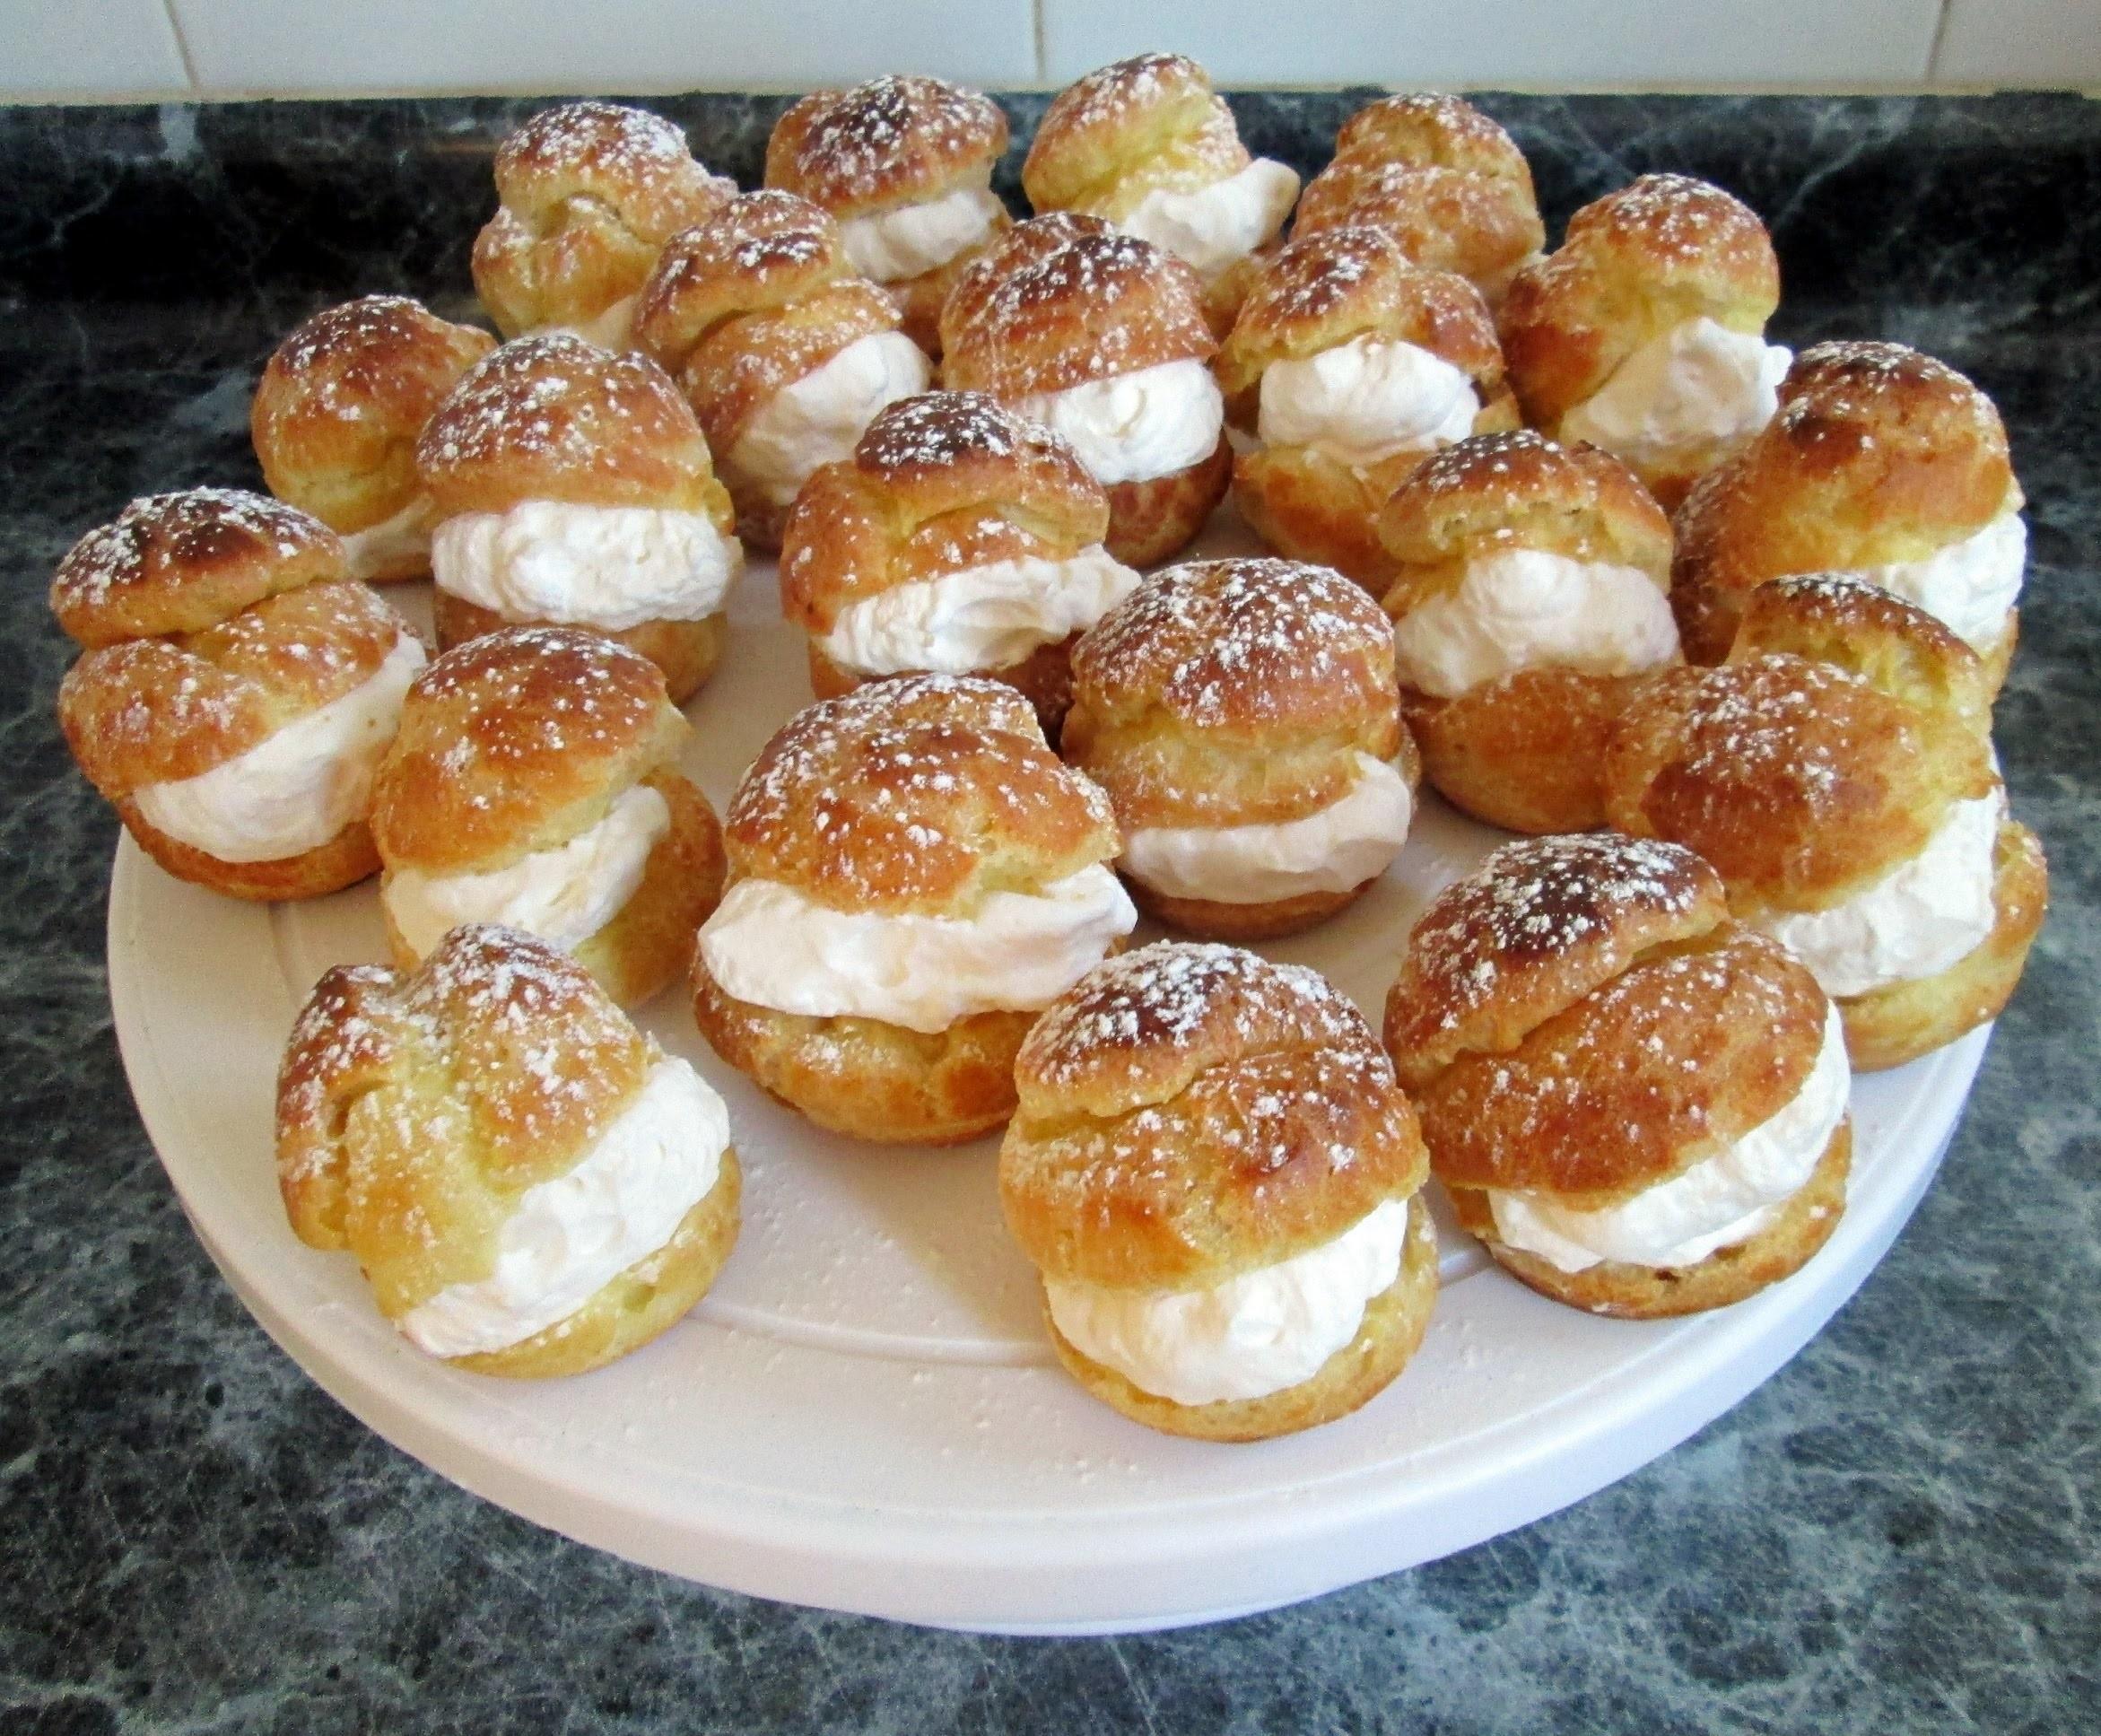 Receta: Profiteroles Con Crema (Paso A Paso) - Silvana Cocina Y Manualidades